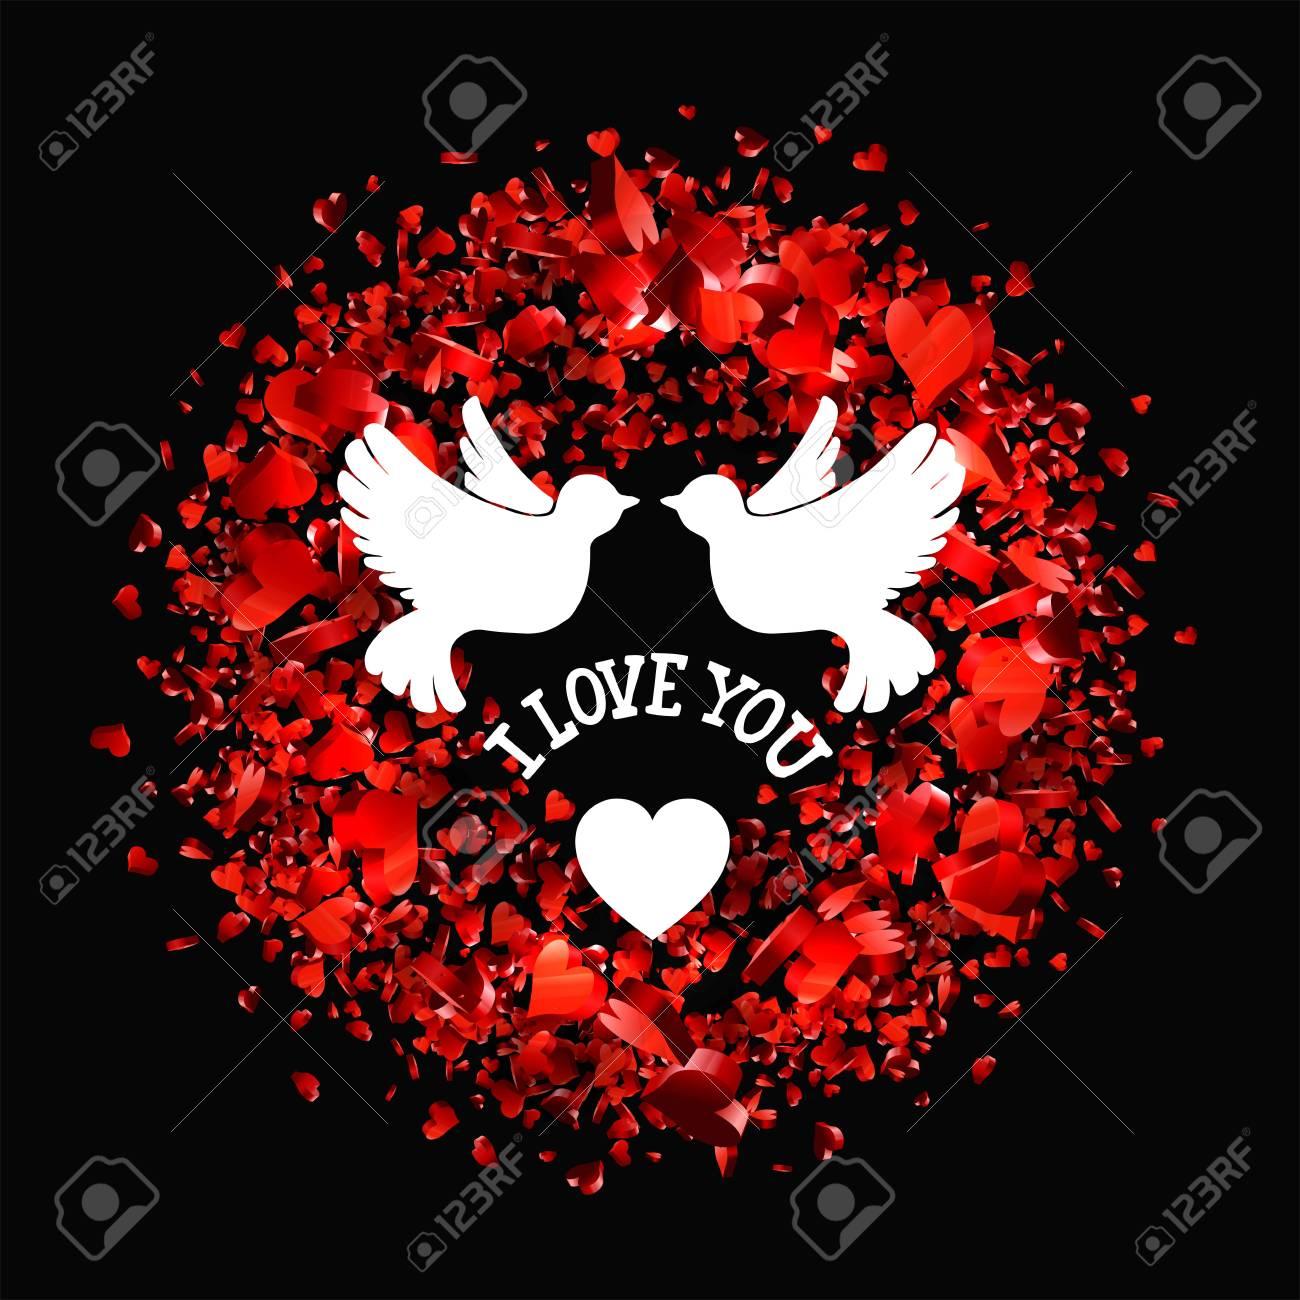 Großzügig Valentines Flyer Vorlage Fotos - Entry Level Resume ...